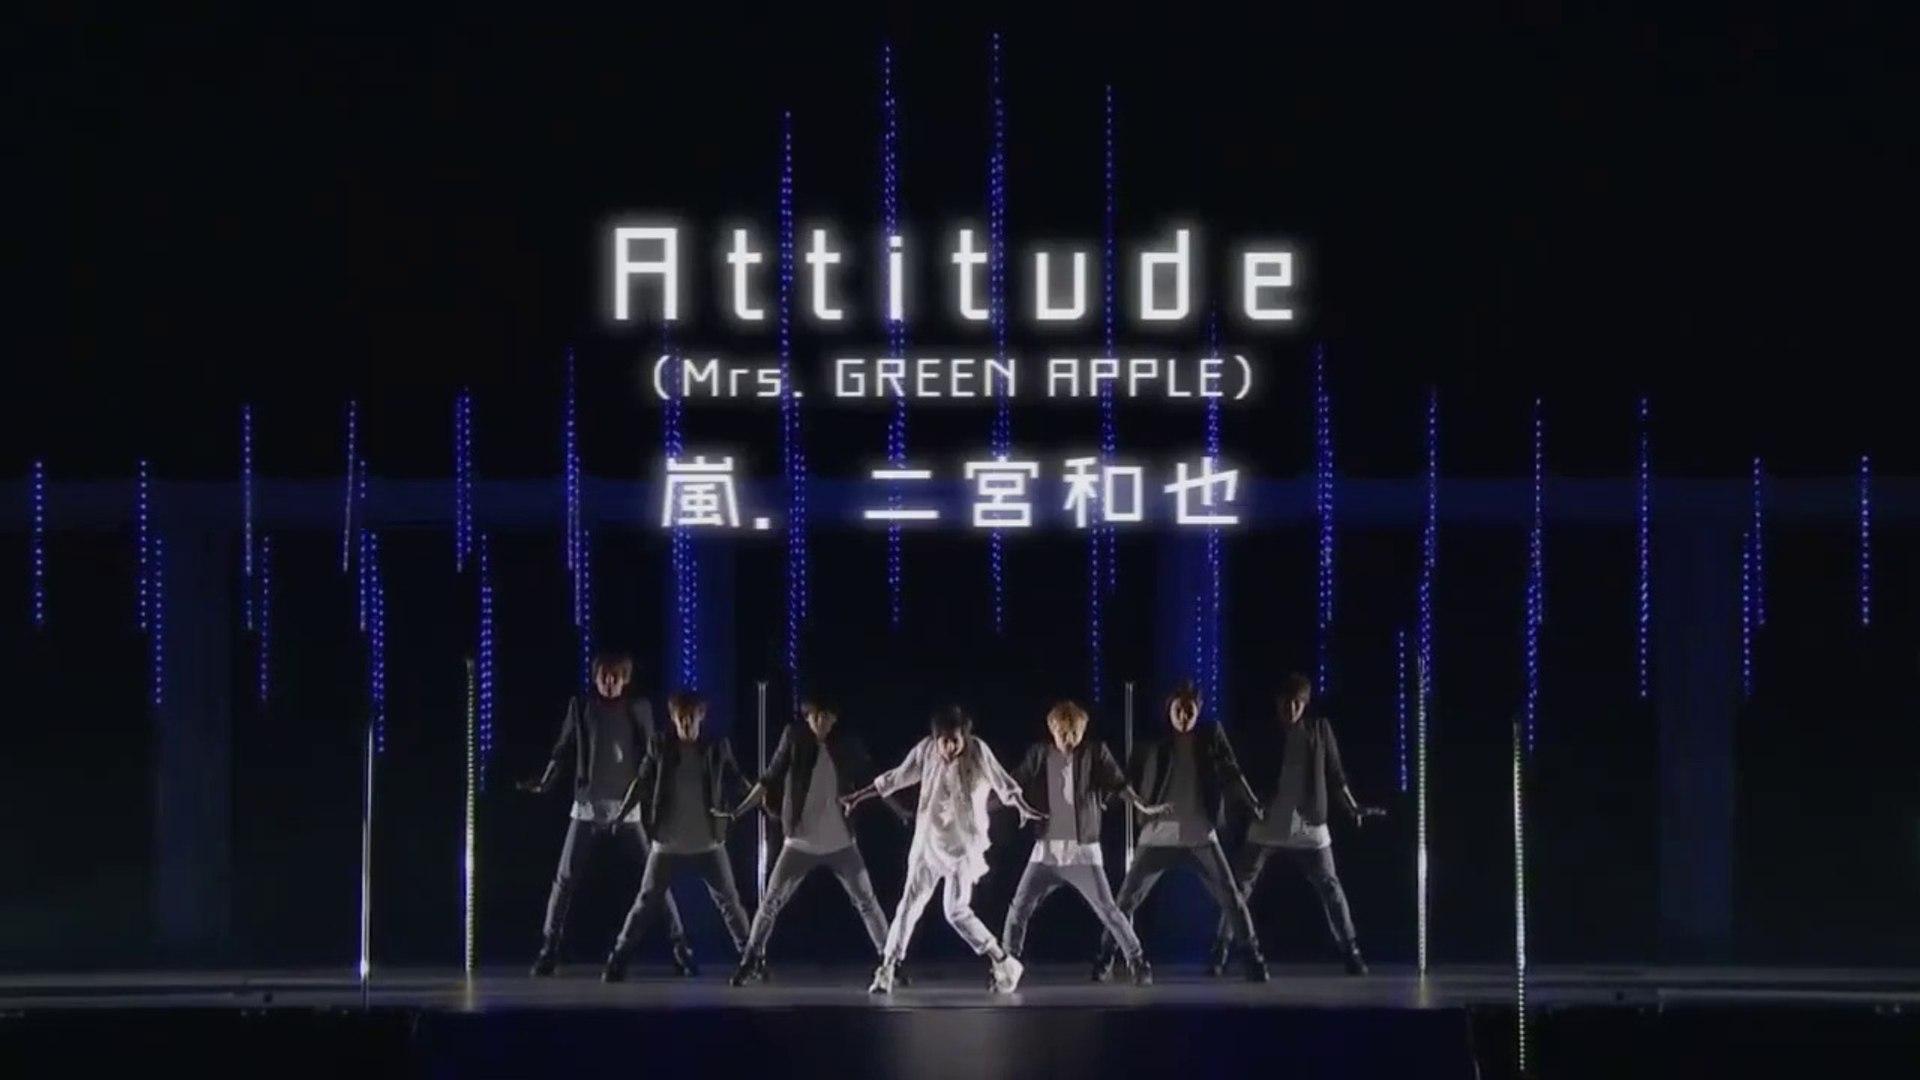 mrs.green apple attitude